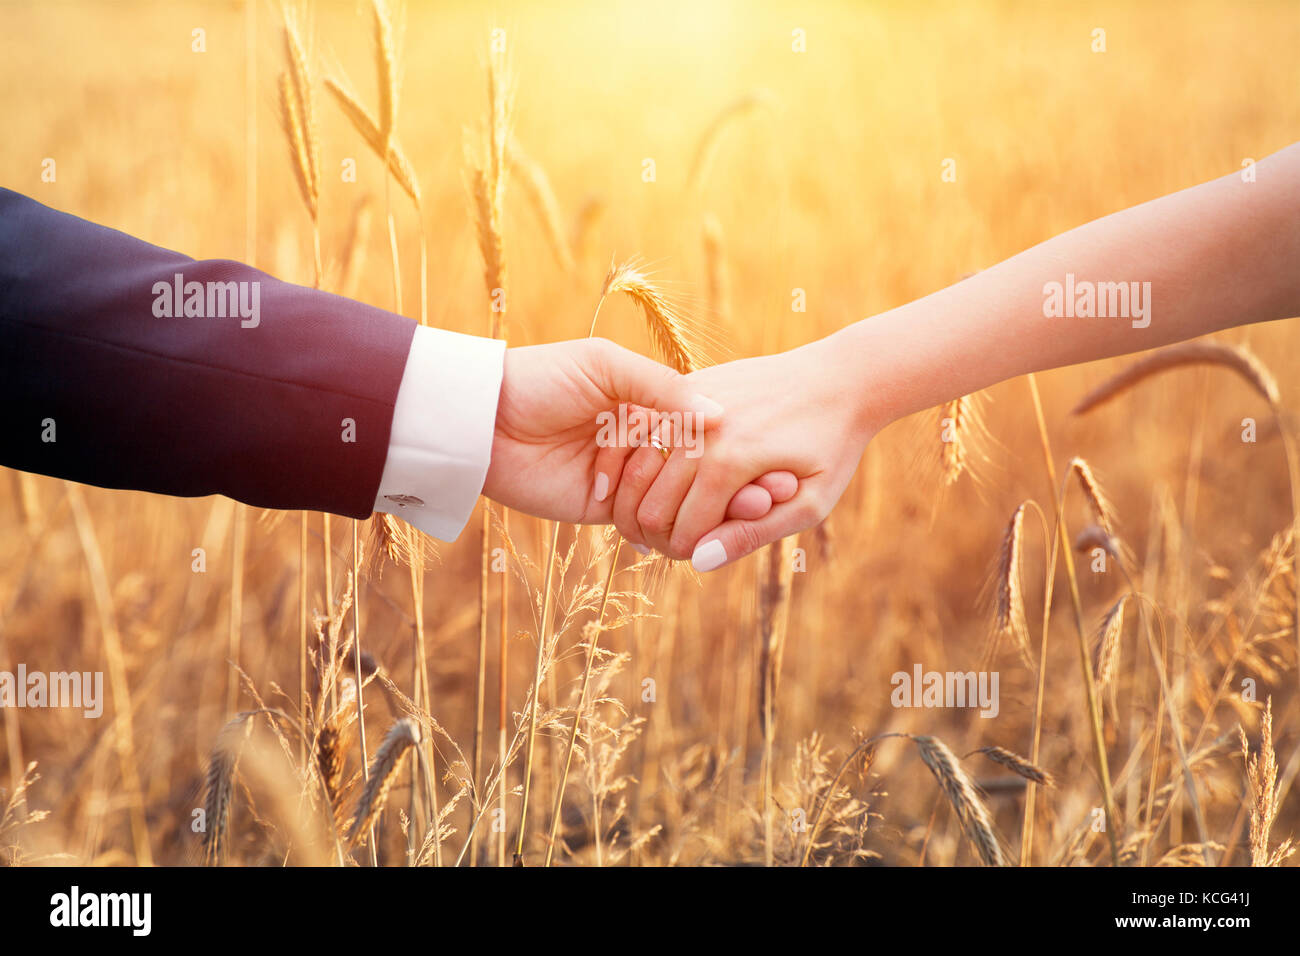 Wedding couple holding hands over ears of corn - Stock Image